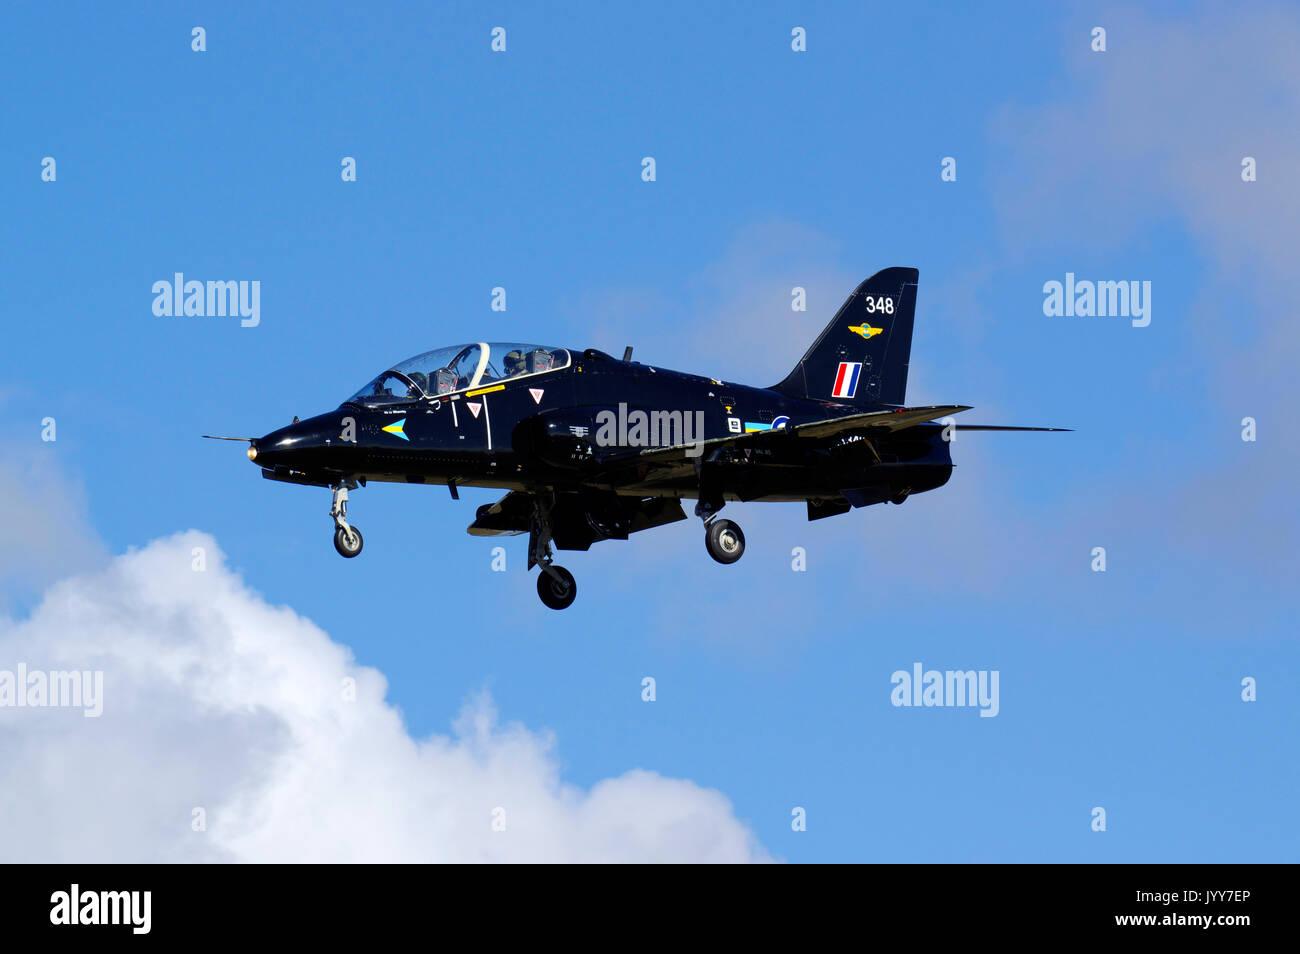 British Aerospace Hawk - Stock Image